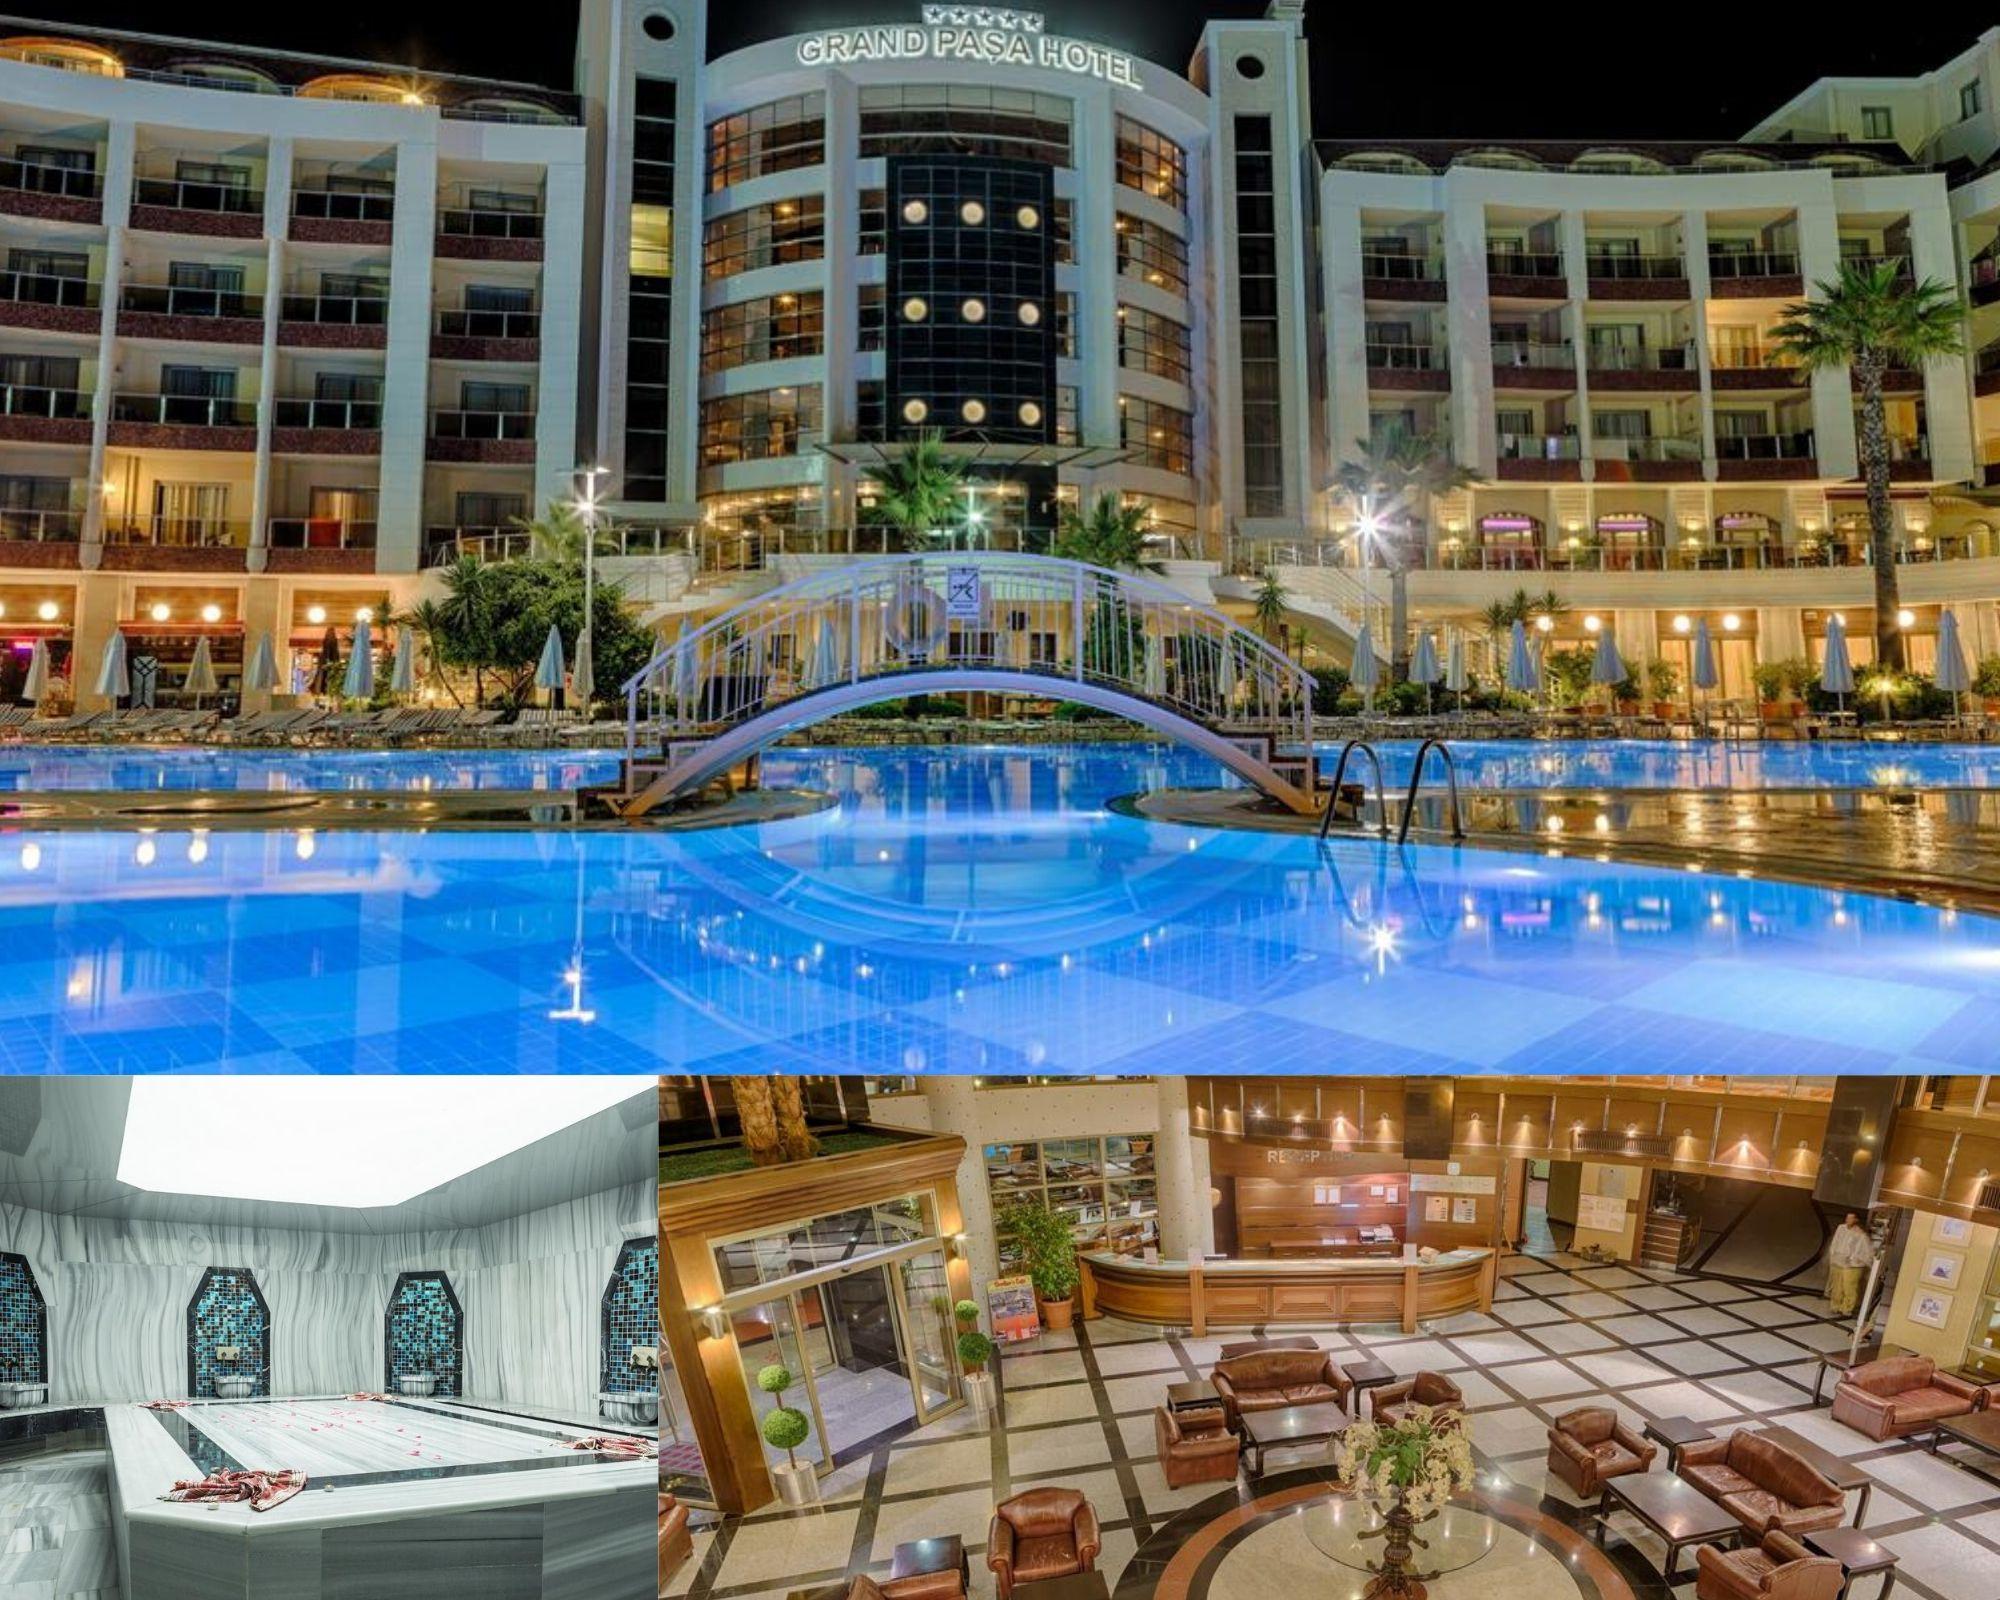 grand-pasa-hotel